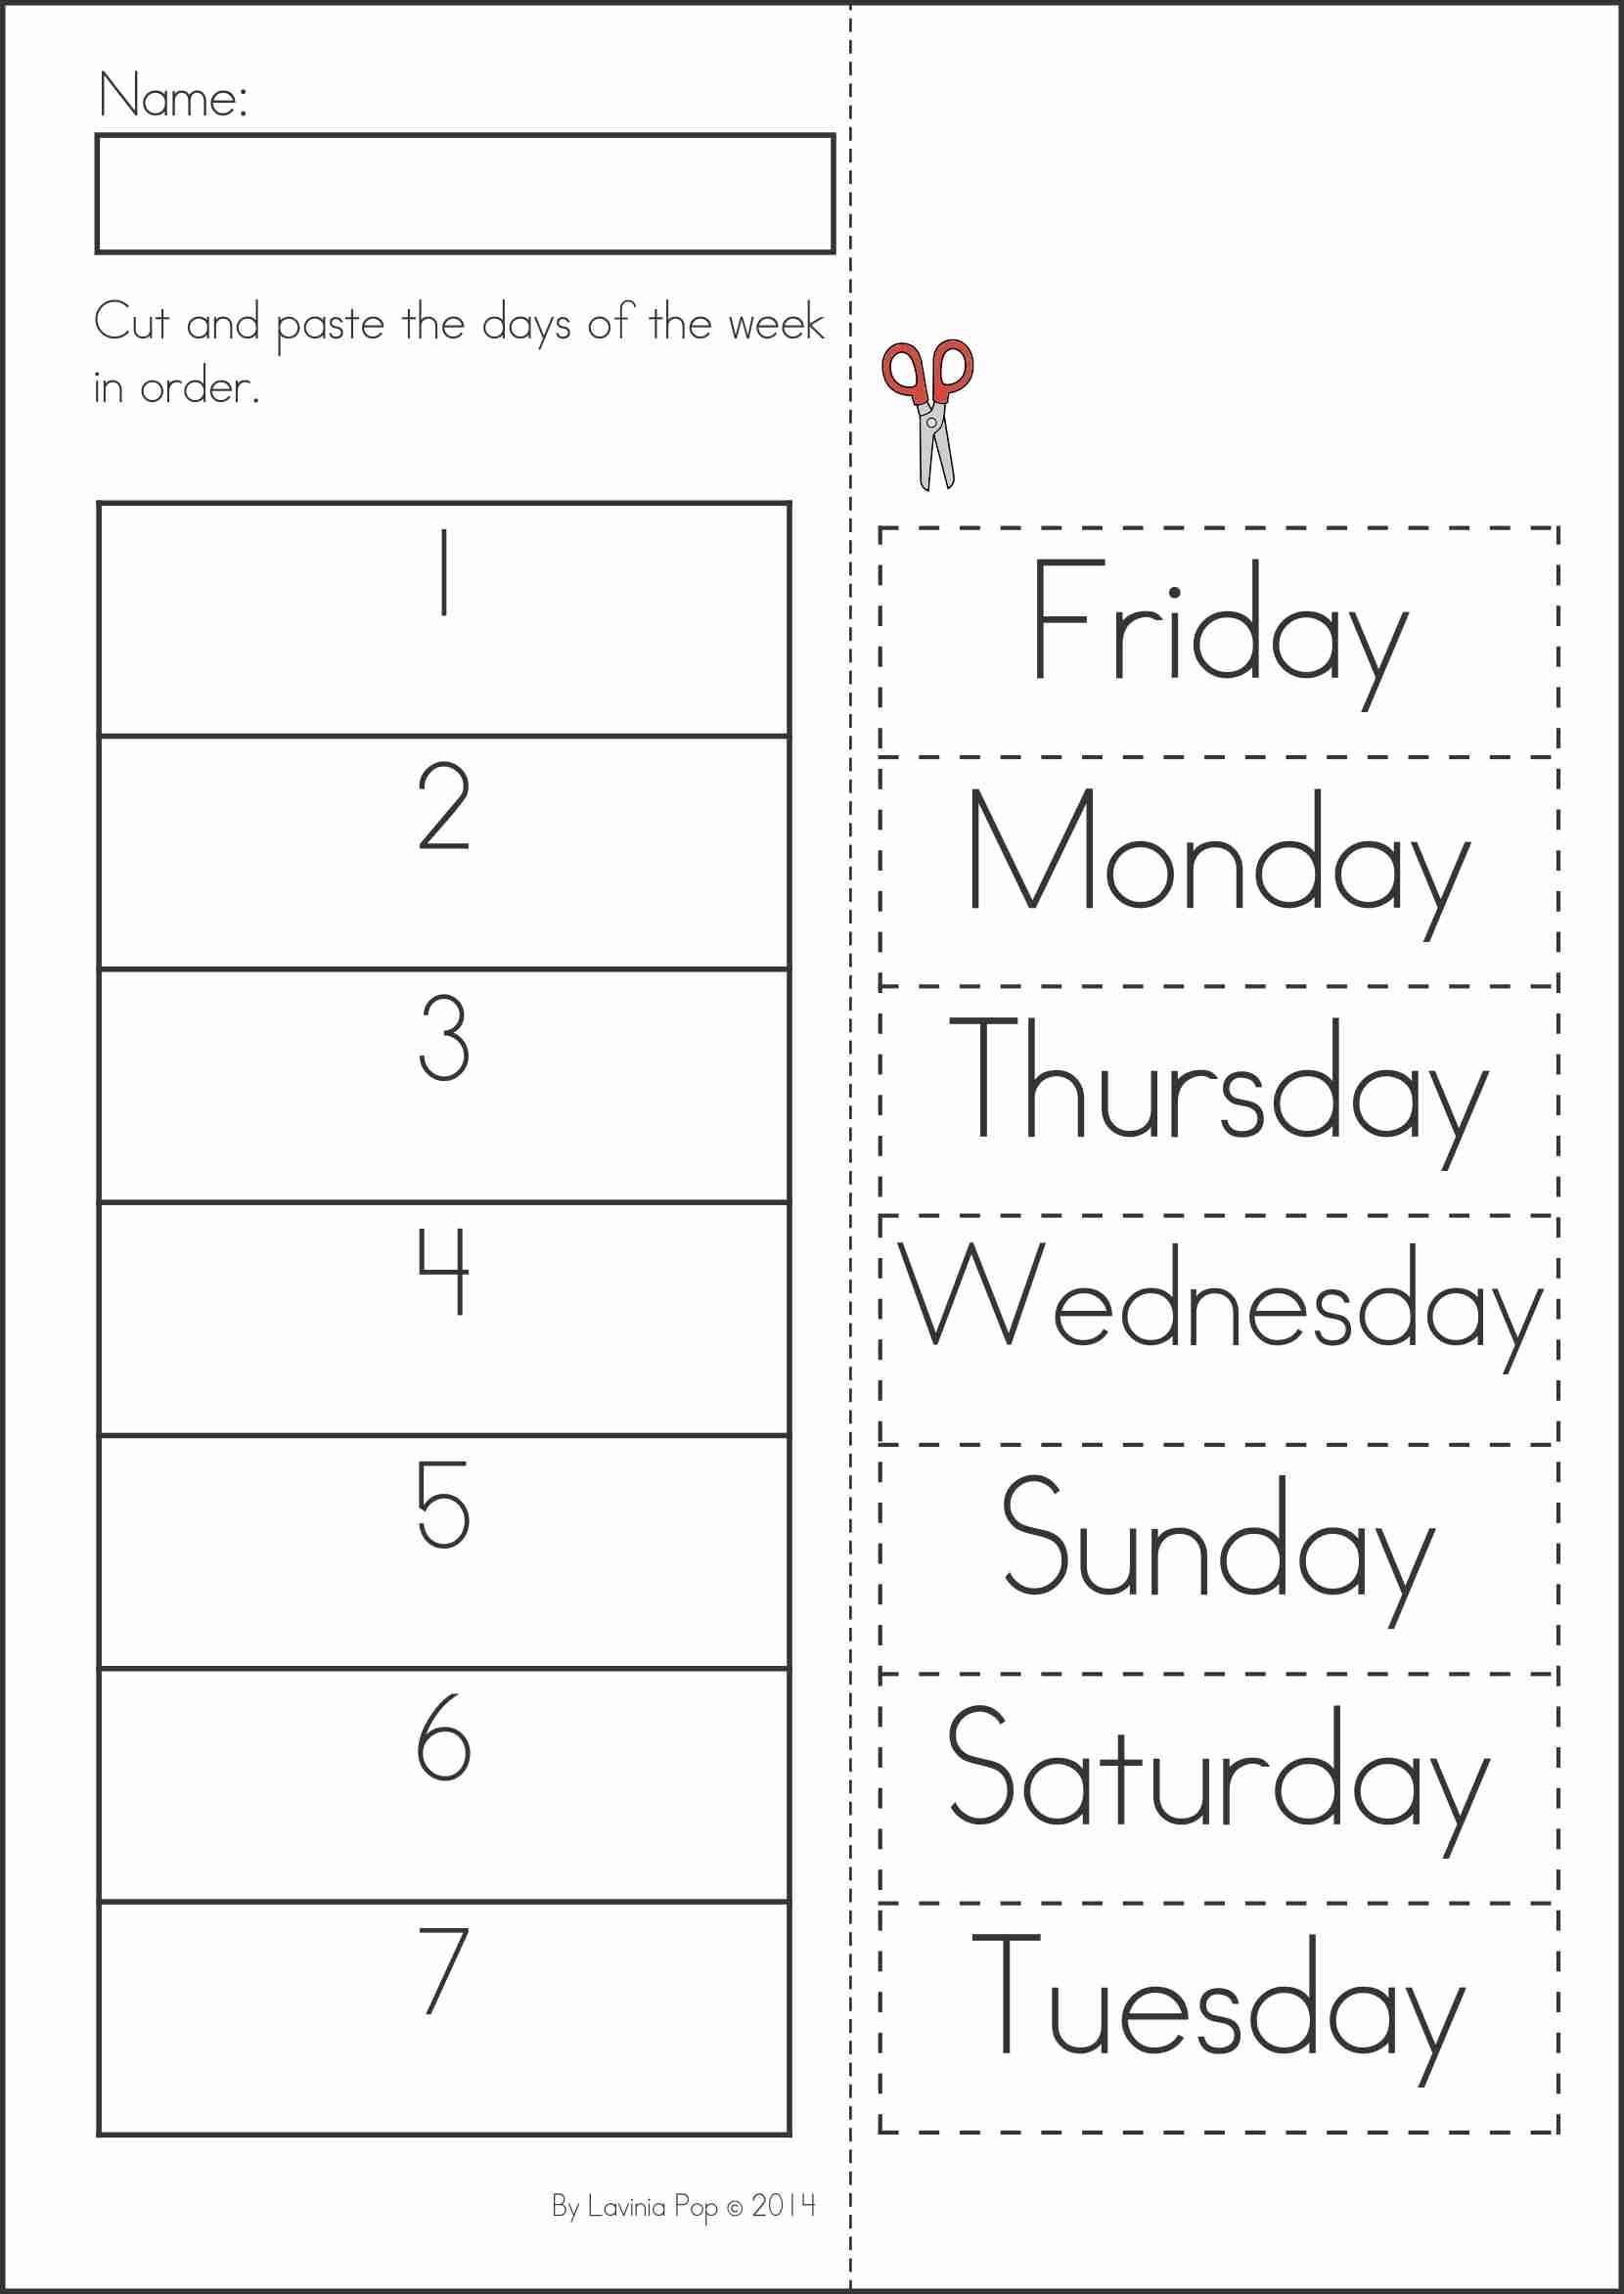 Unique Kindergarten Worksheets Cut And Paste | Fun Worksheet - Free Printable Kindergarten Worksheets Cut And Paste